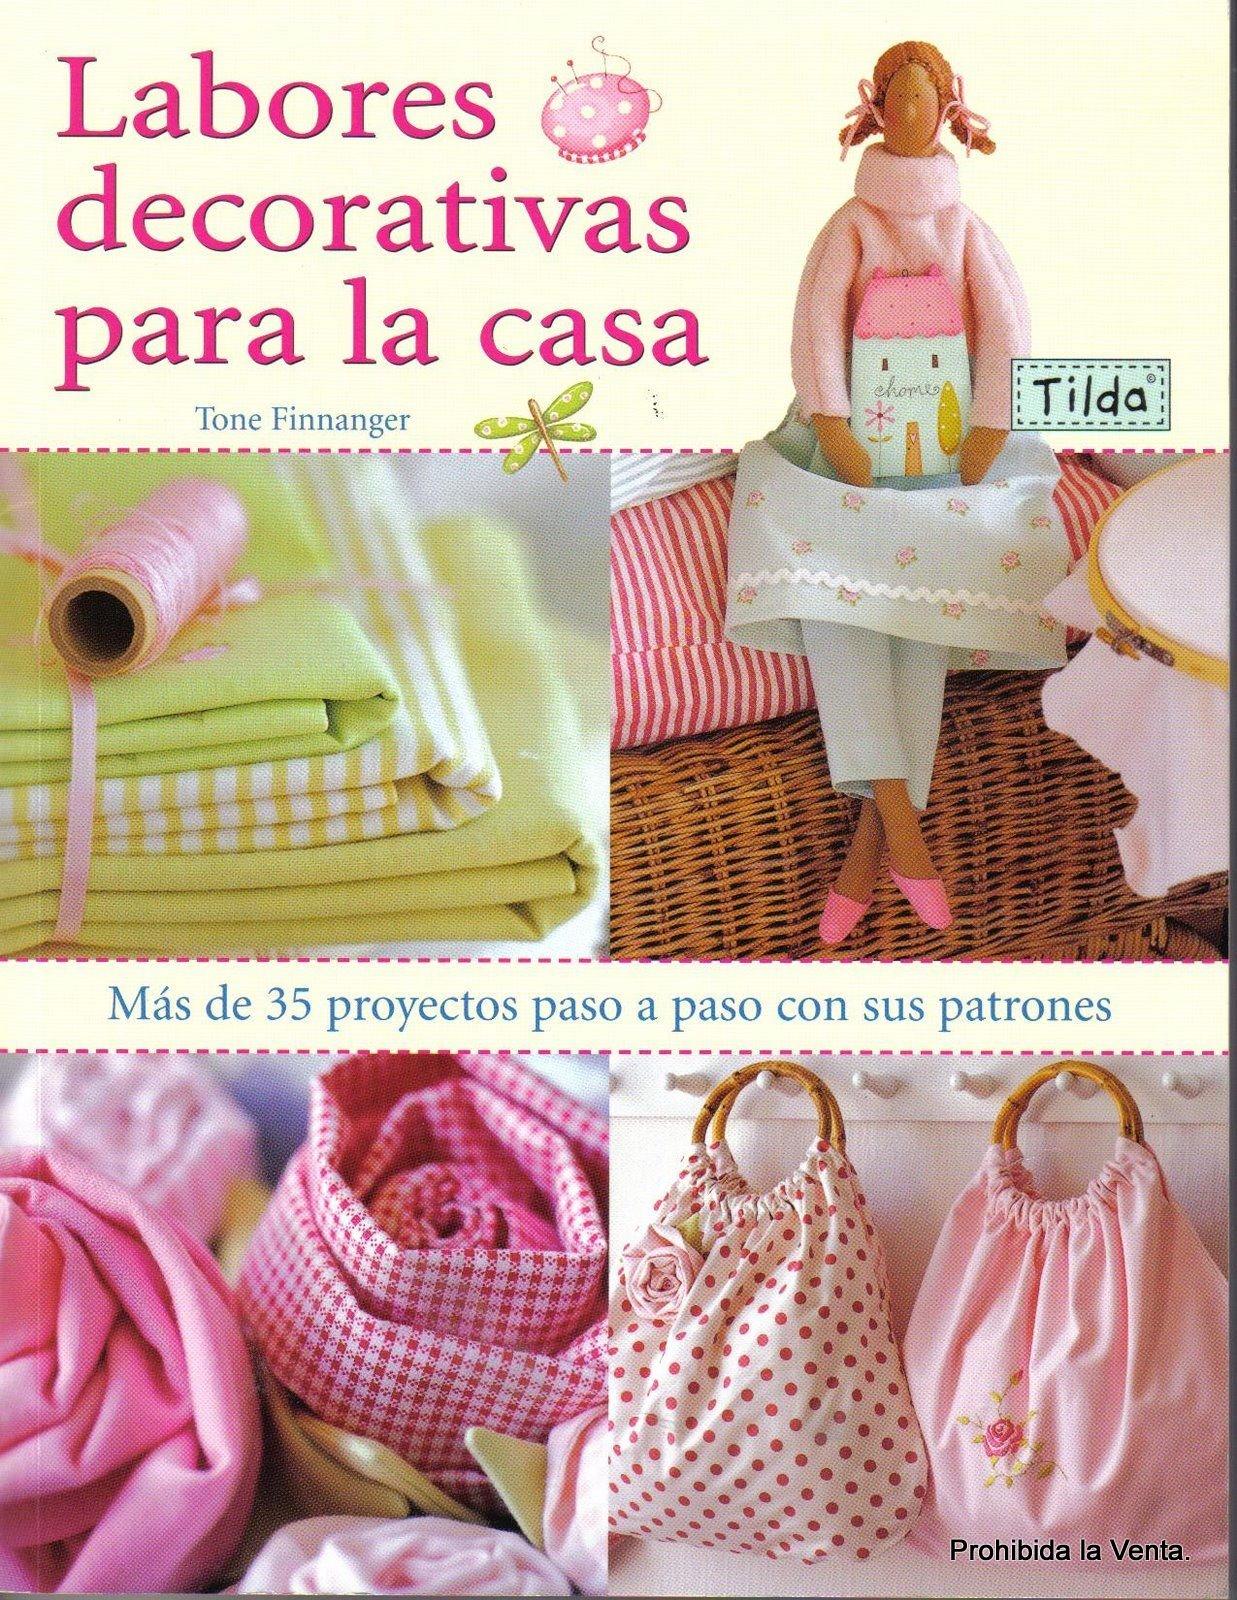 De manualidades para descargar tilda labores decorativas for Mamparas decorativas para casa